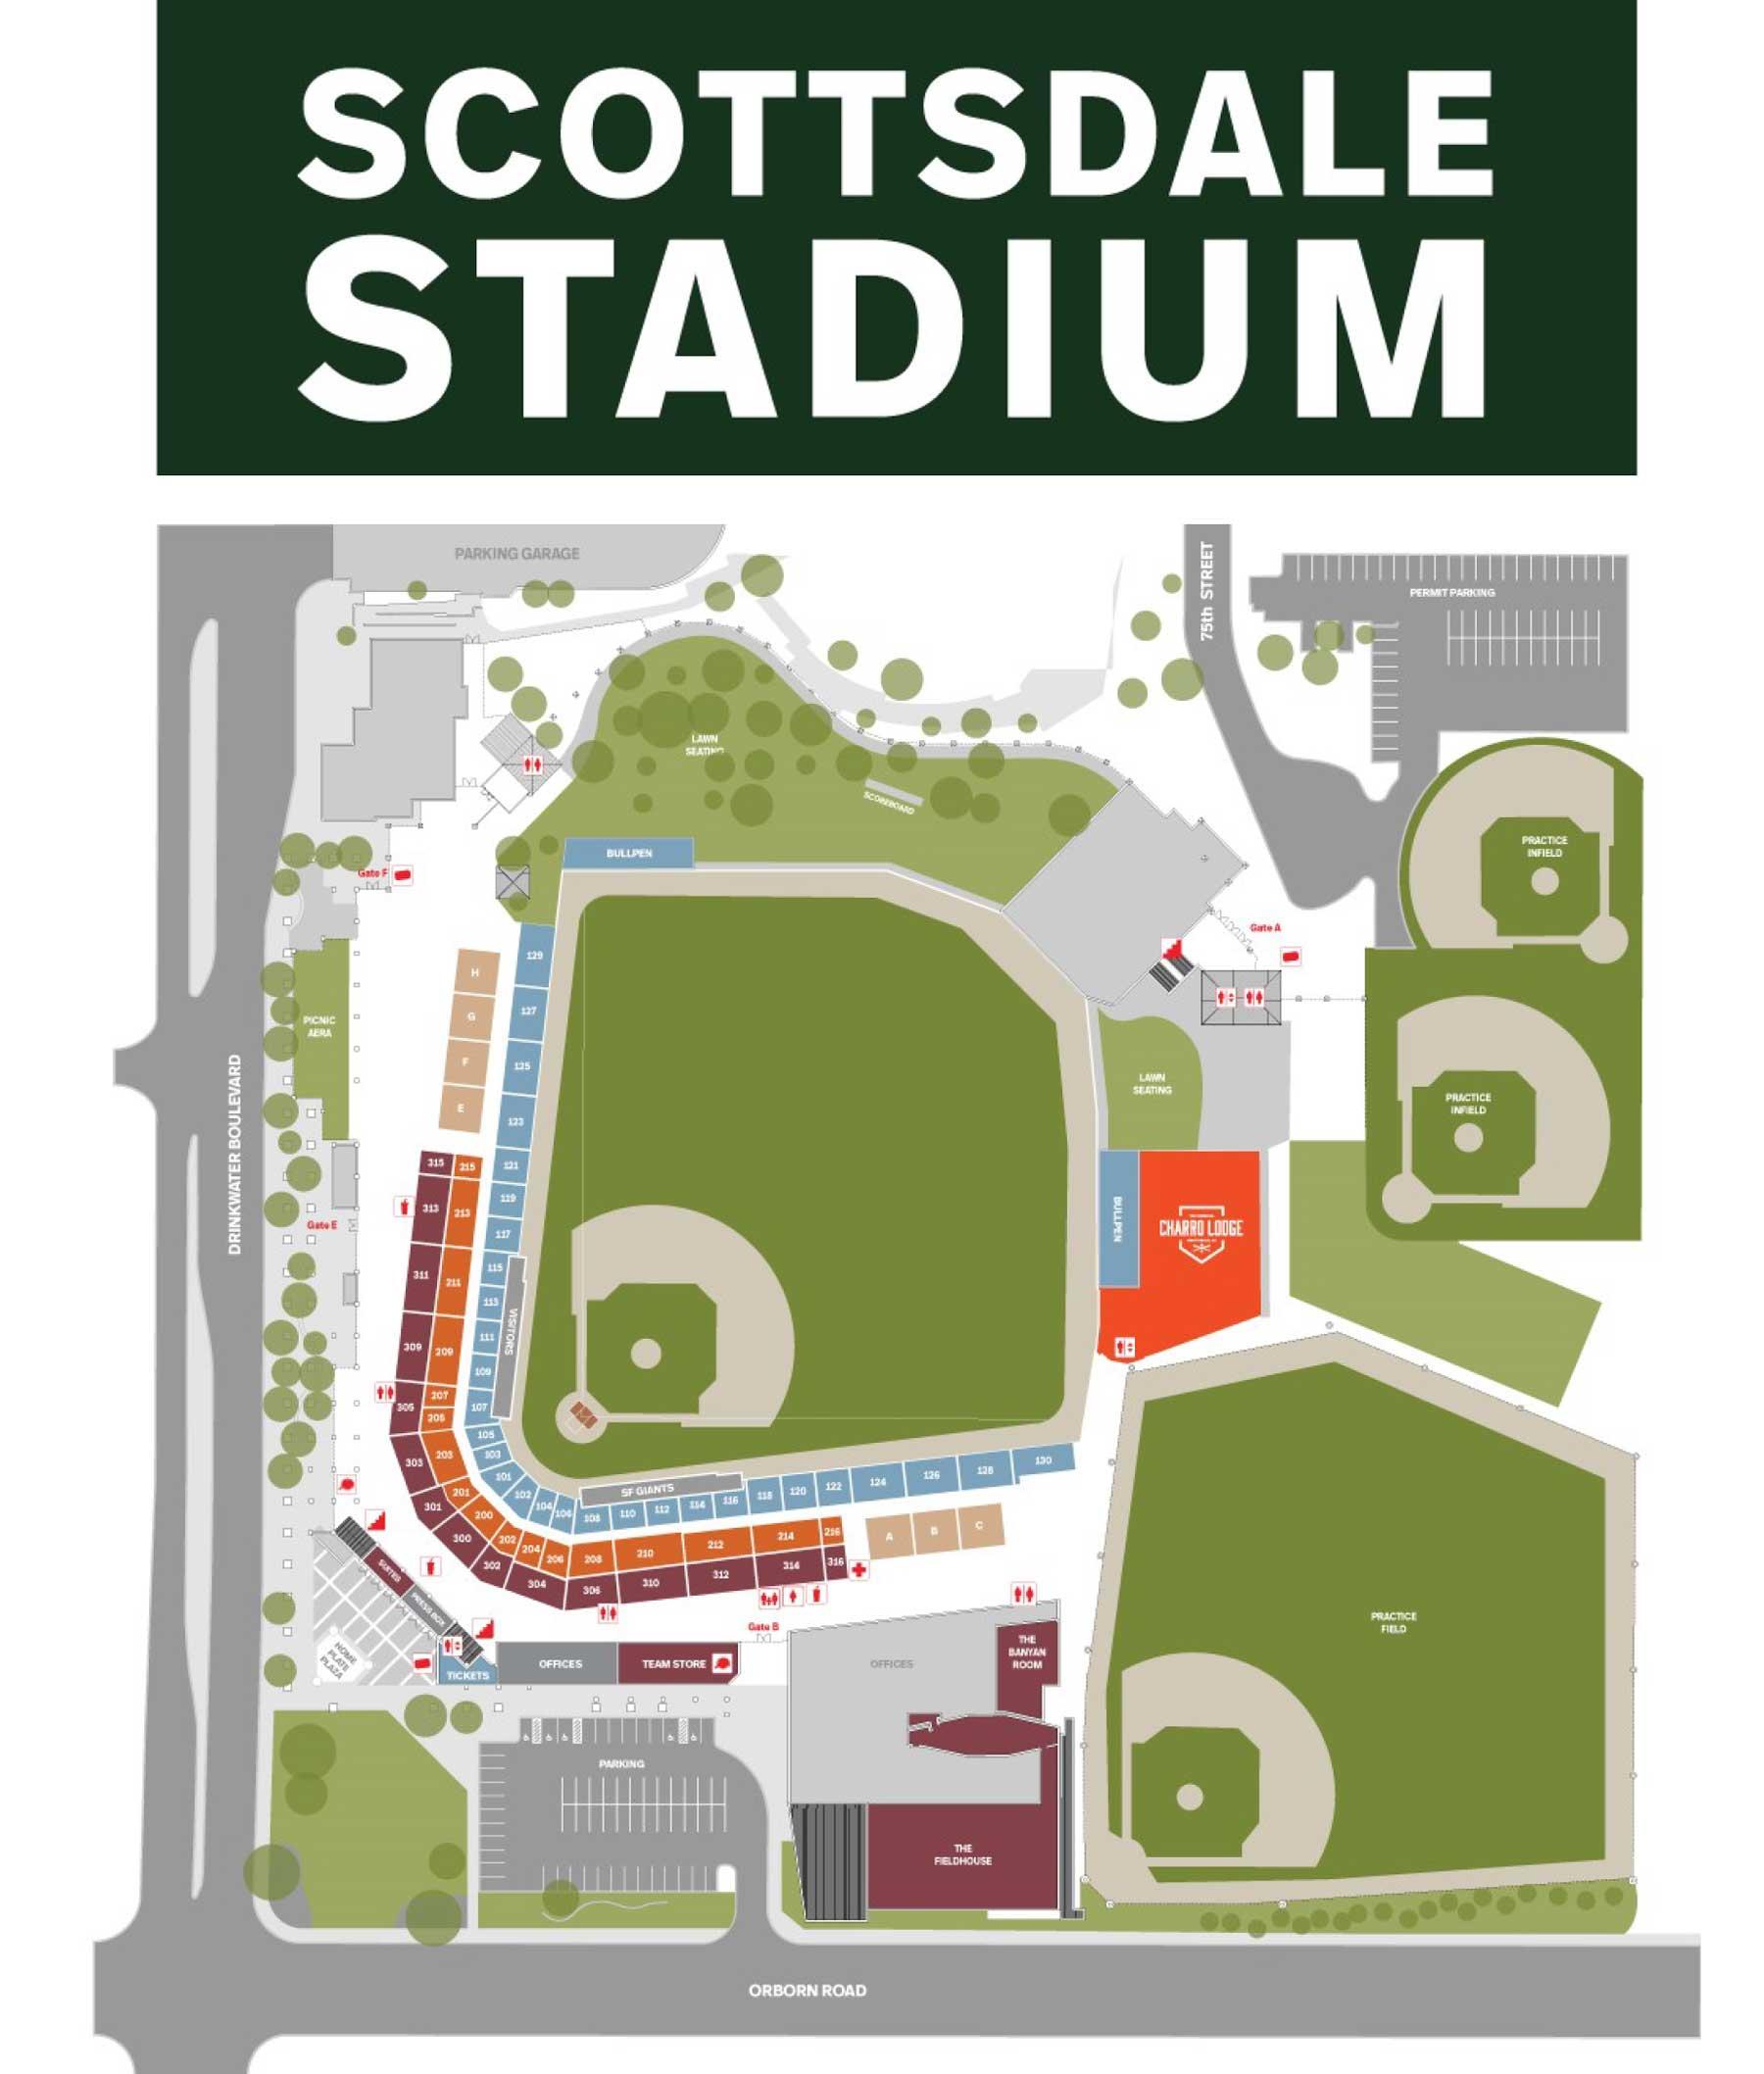 Scottsdale Stadium Map